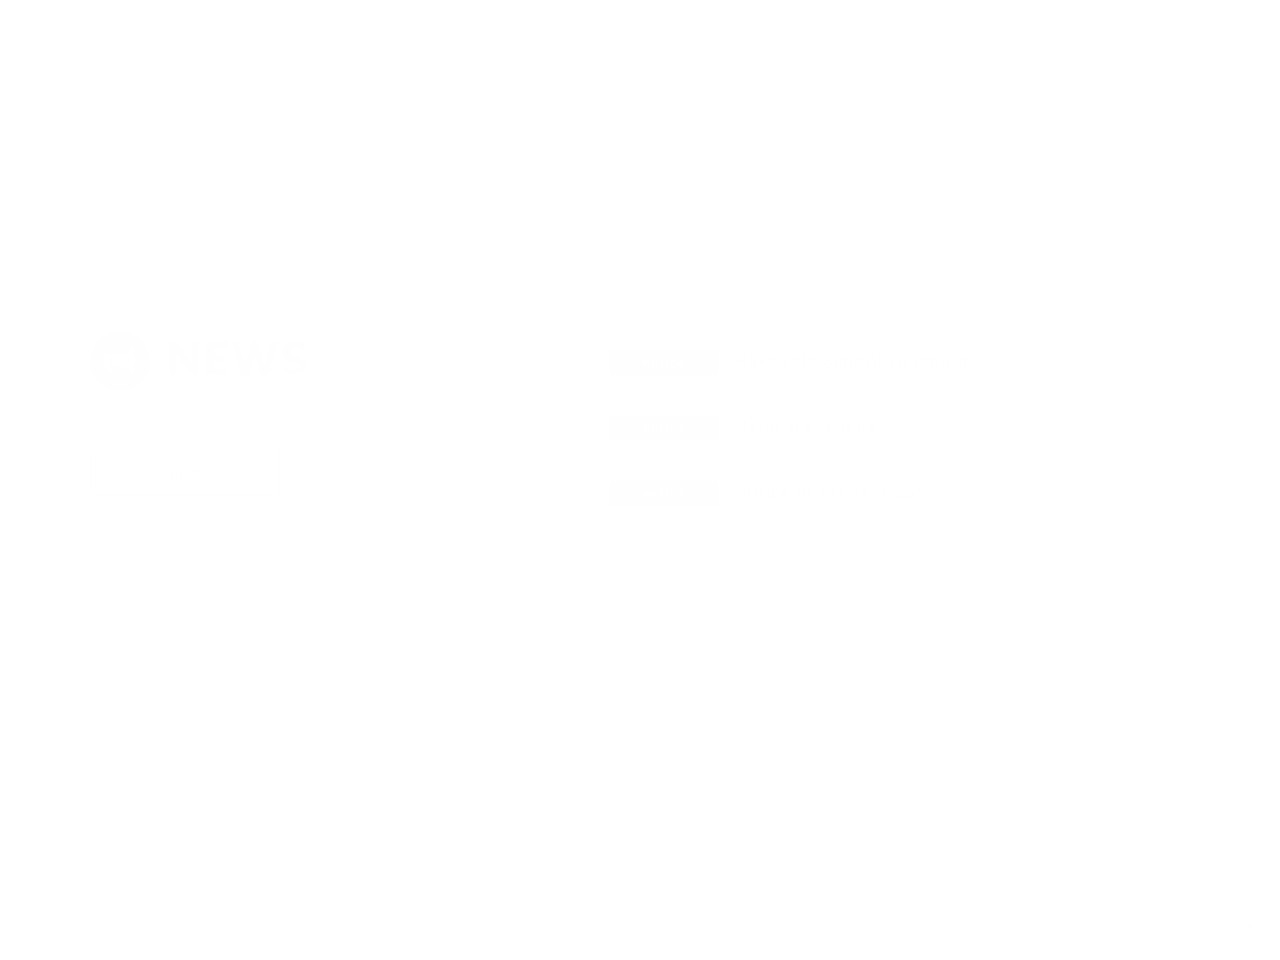 日本国際語学アカデミー京都校